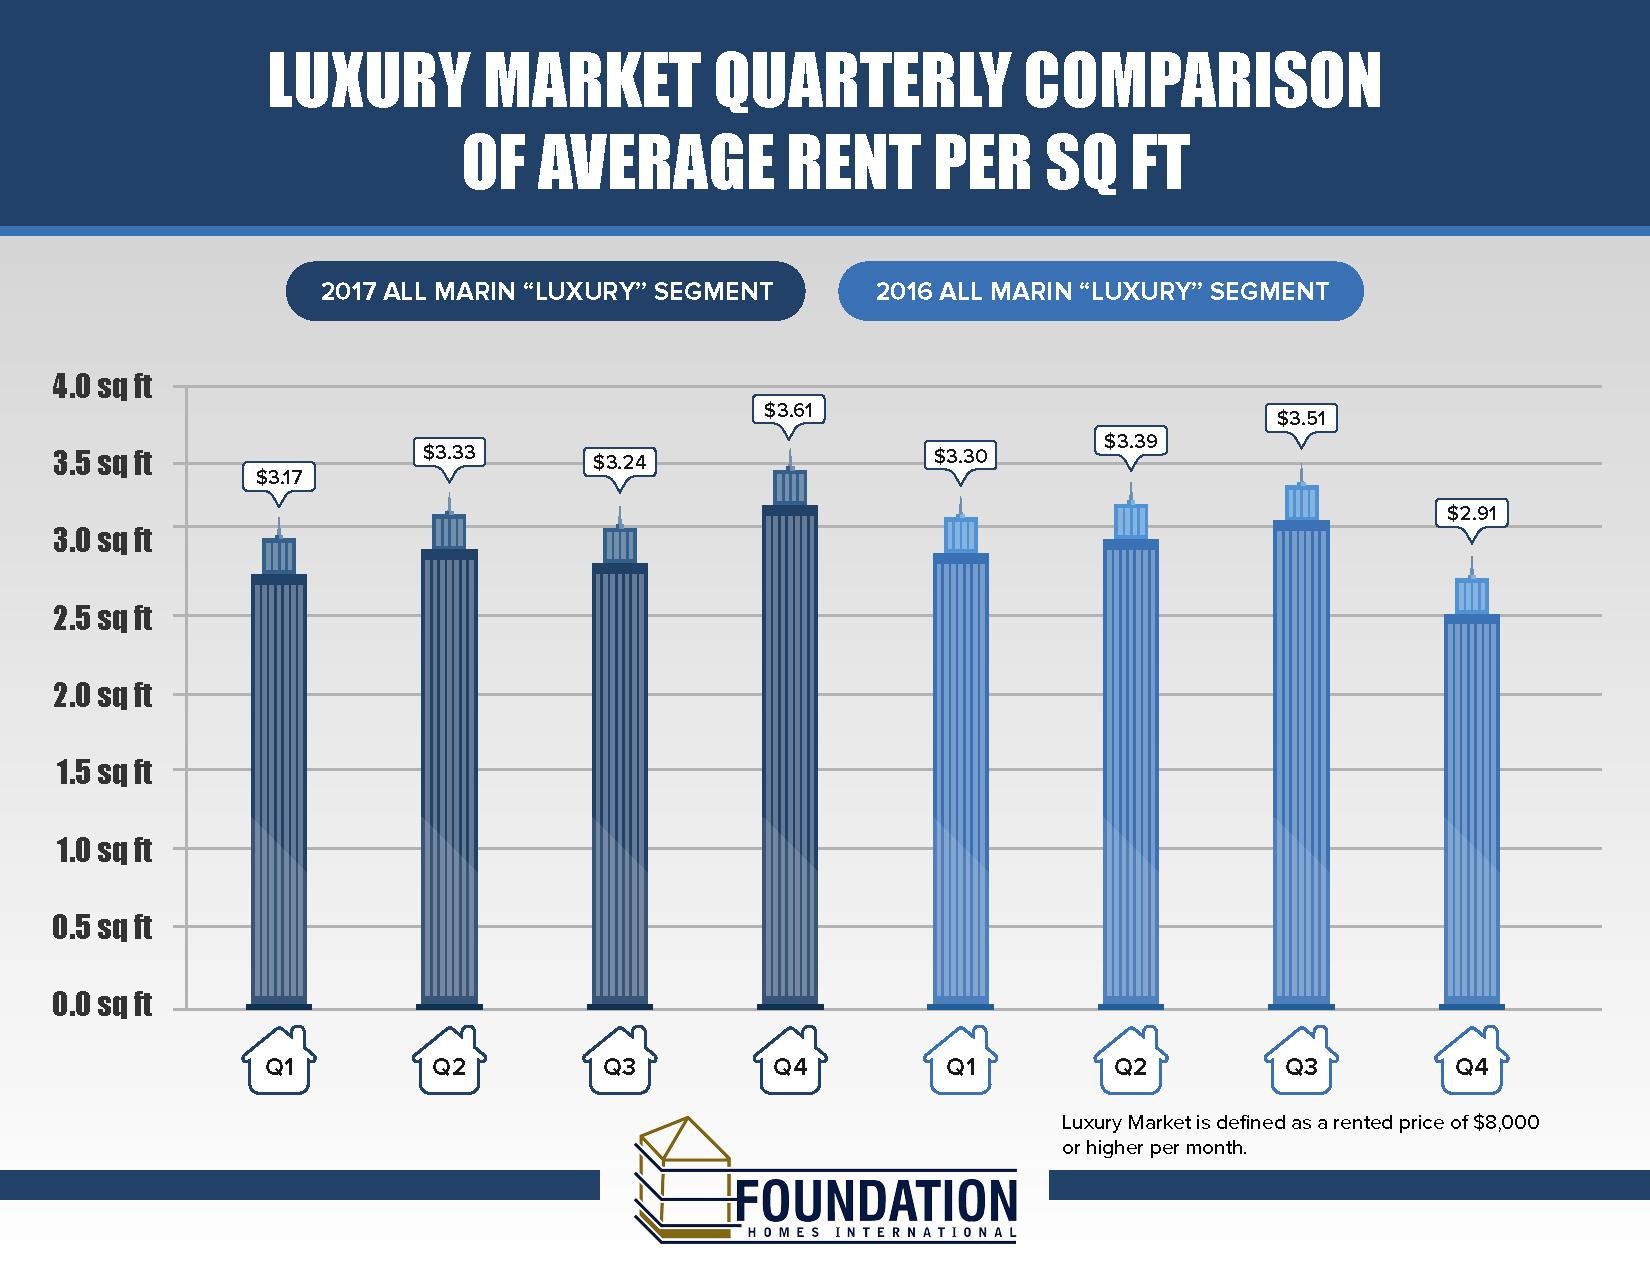 Luxury Market Quarterly Comparison of Average Rent Per Sq Ft